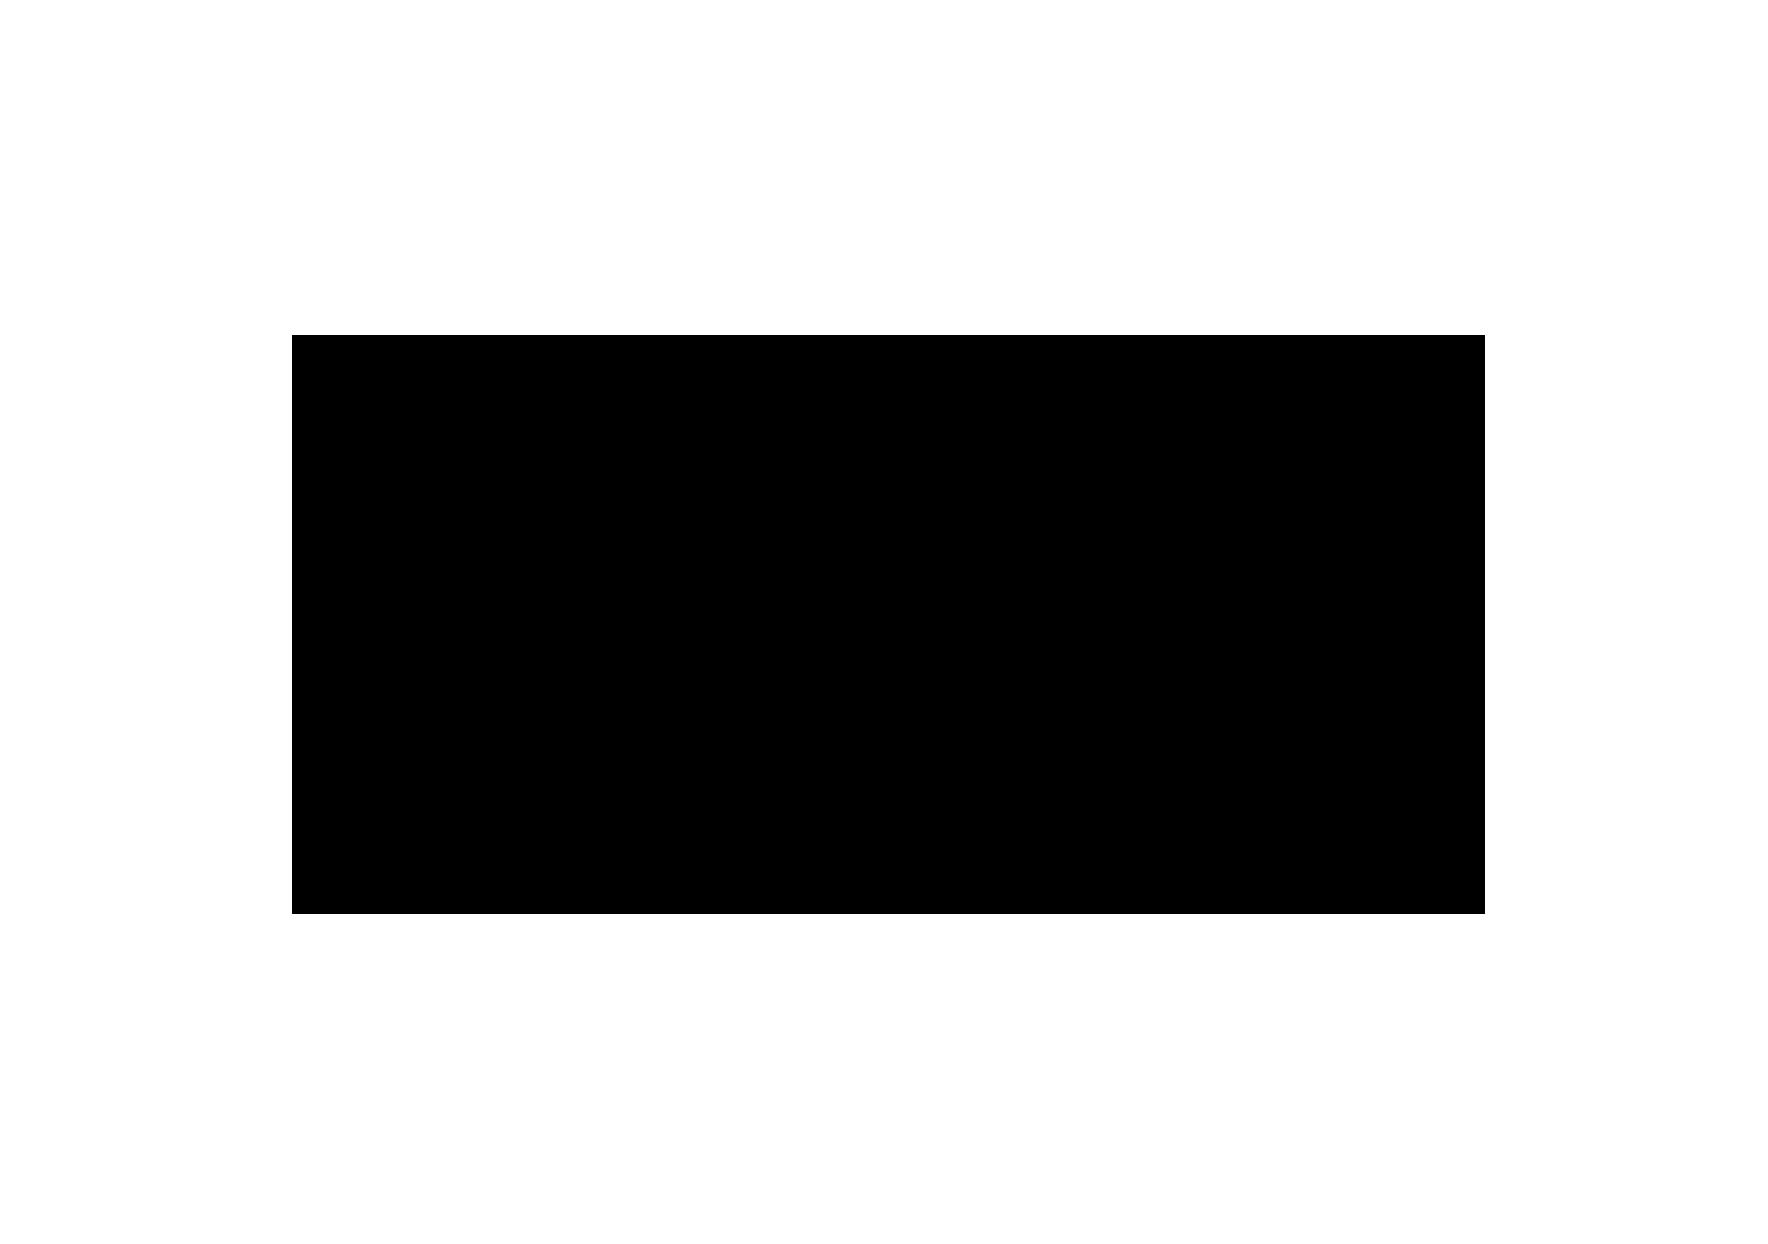 مخطوطه رمضان كريم مفرغه 8 15 مخطوطه لشهر رمضان بالخط الحر png